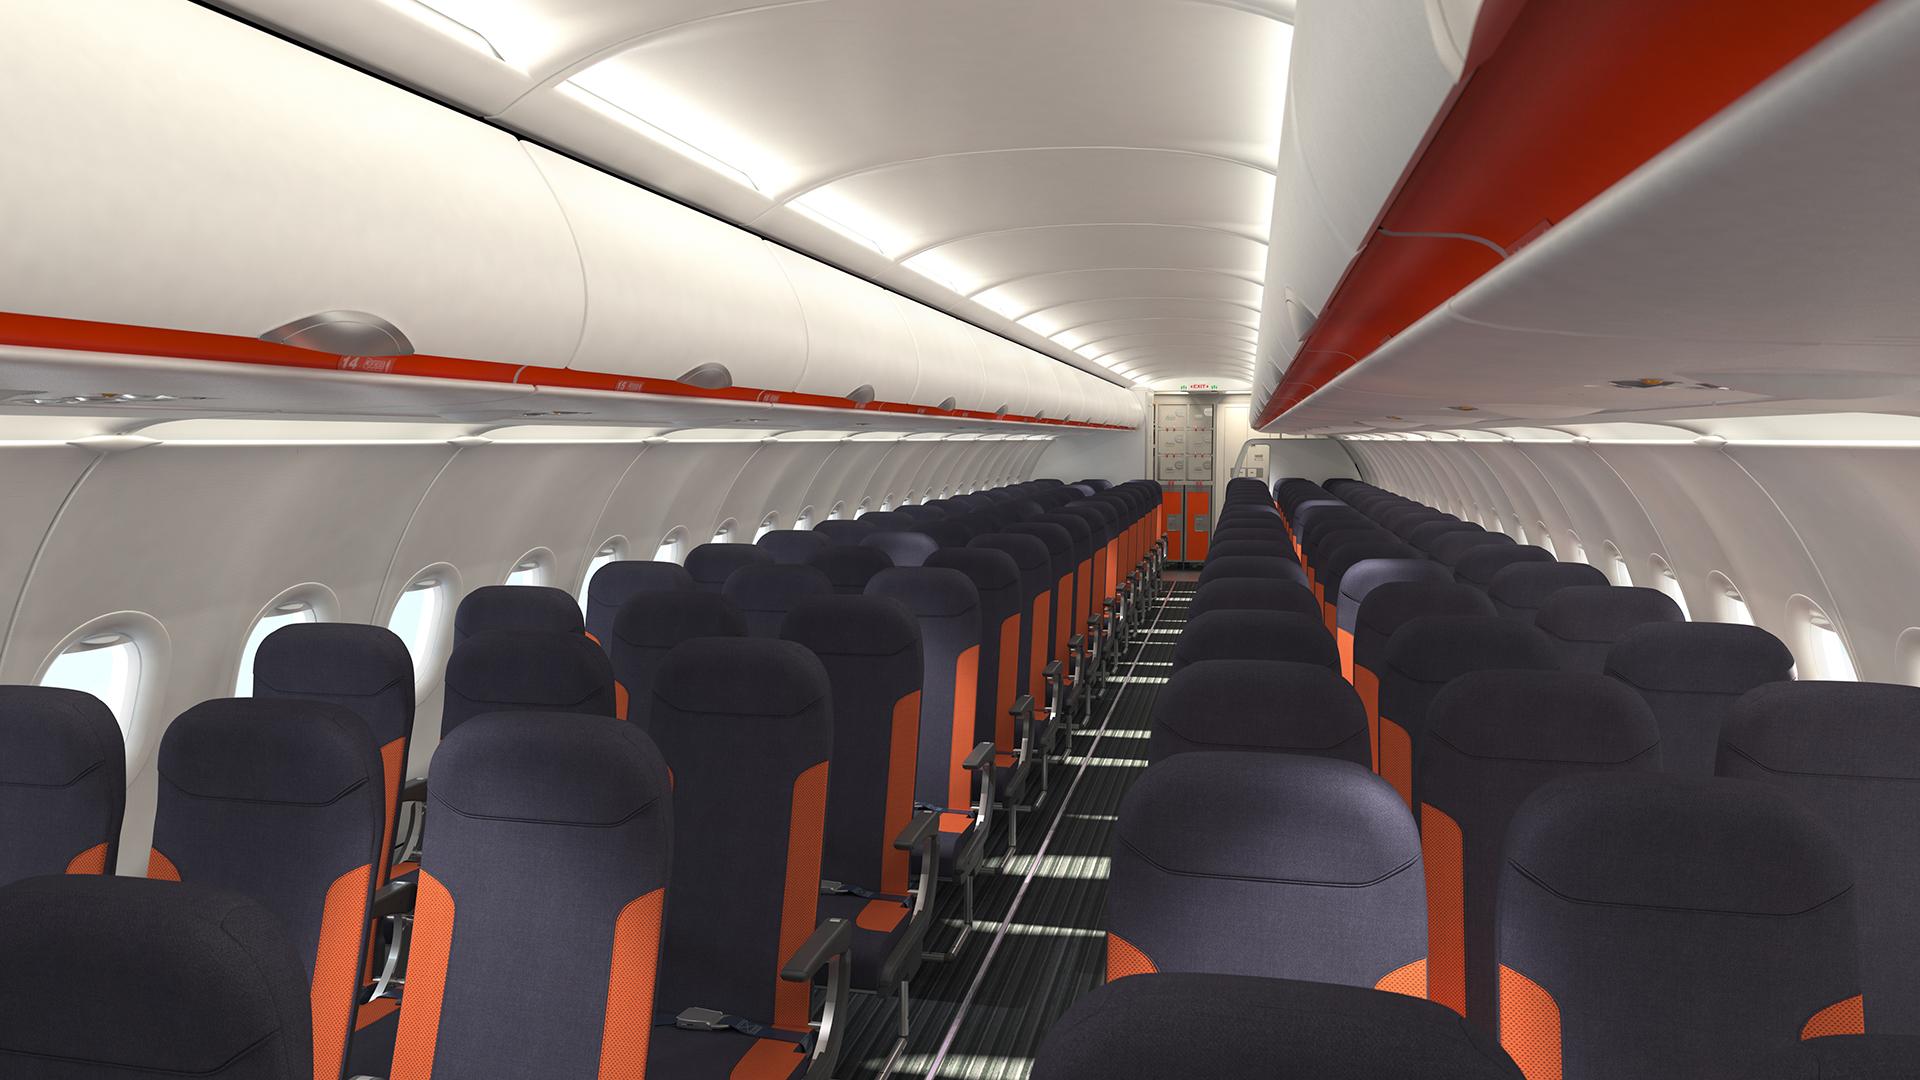 easyjet casestudy Case study: easyjet and ryanair flying high with low prices toifl edith, maike klement hamiyet karaman, tsolmonzul erevgiylkham fk abwl marketing 040177/1.